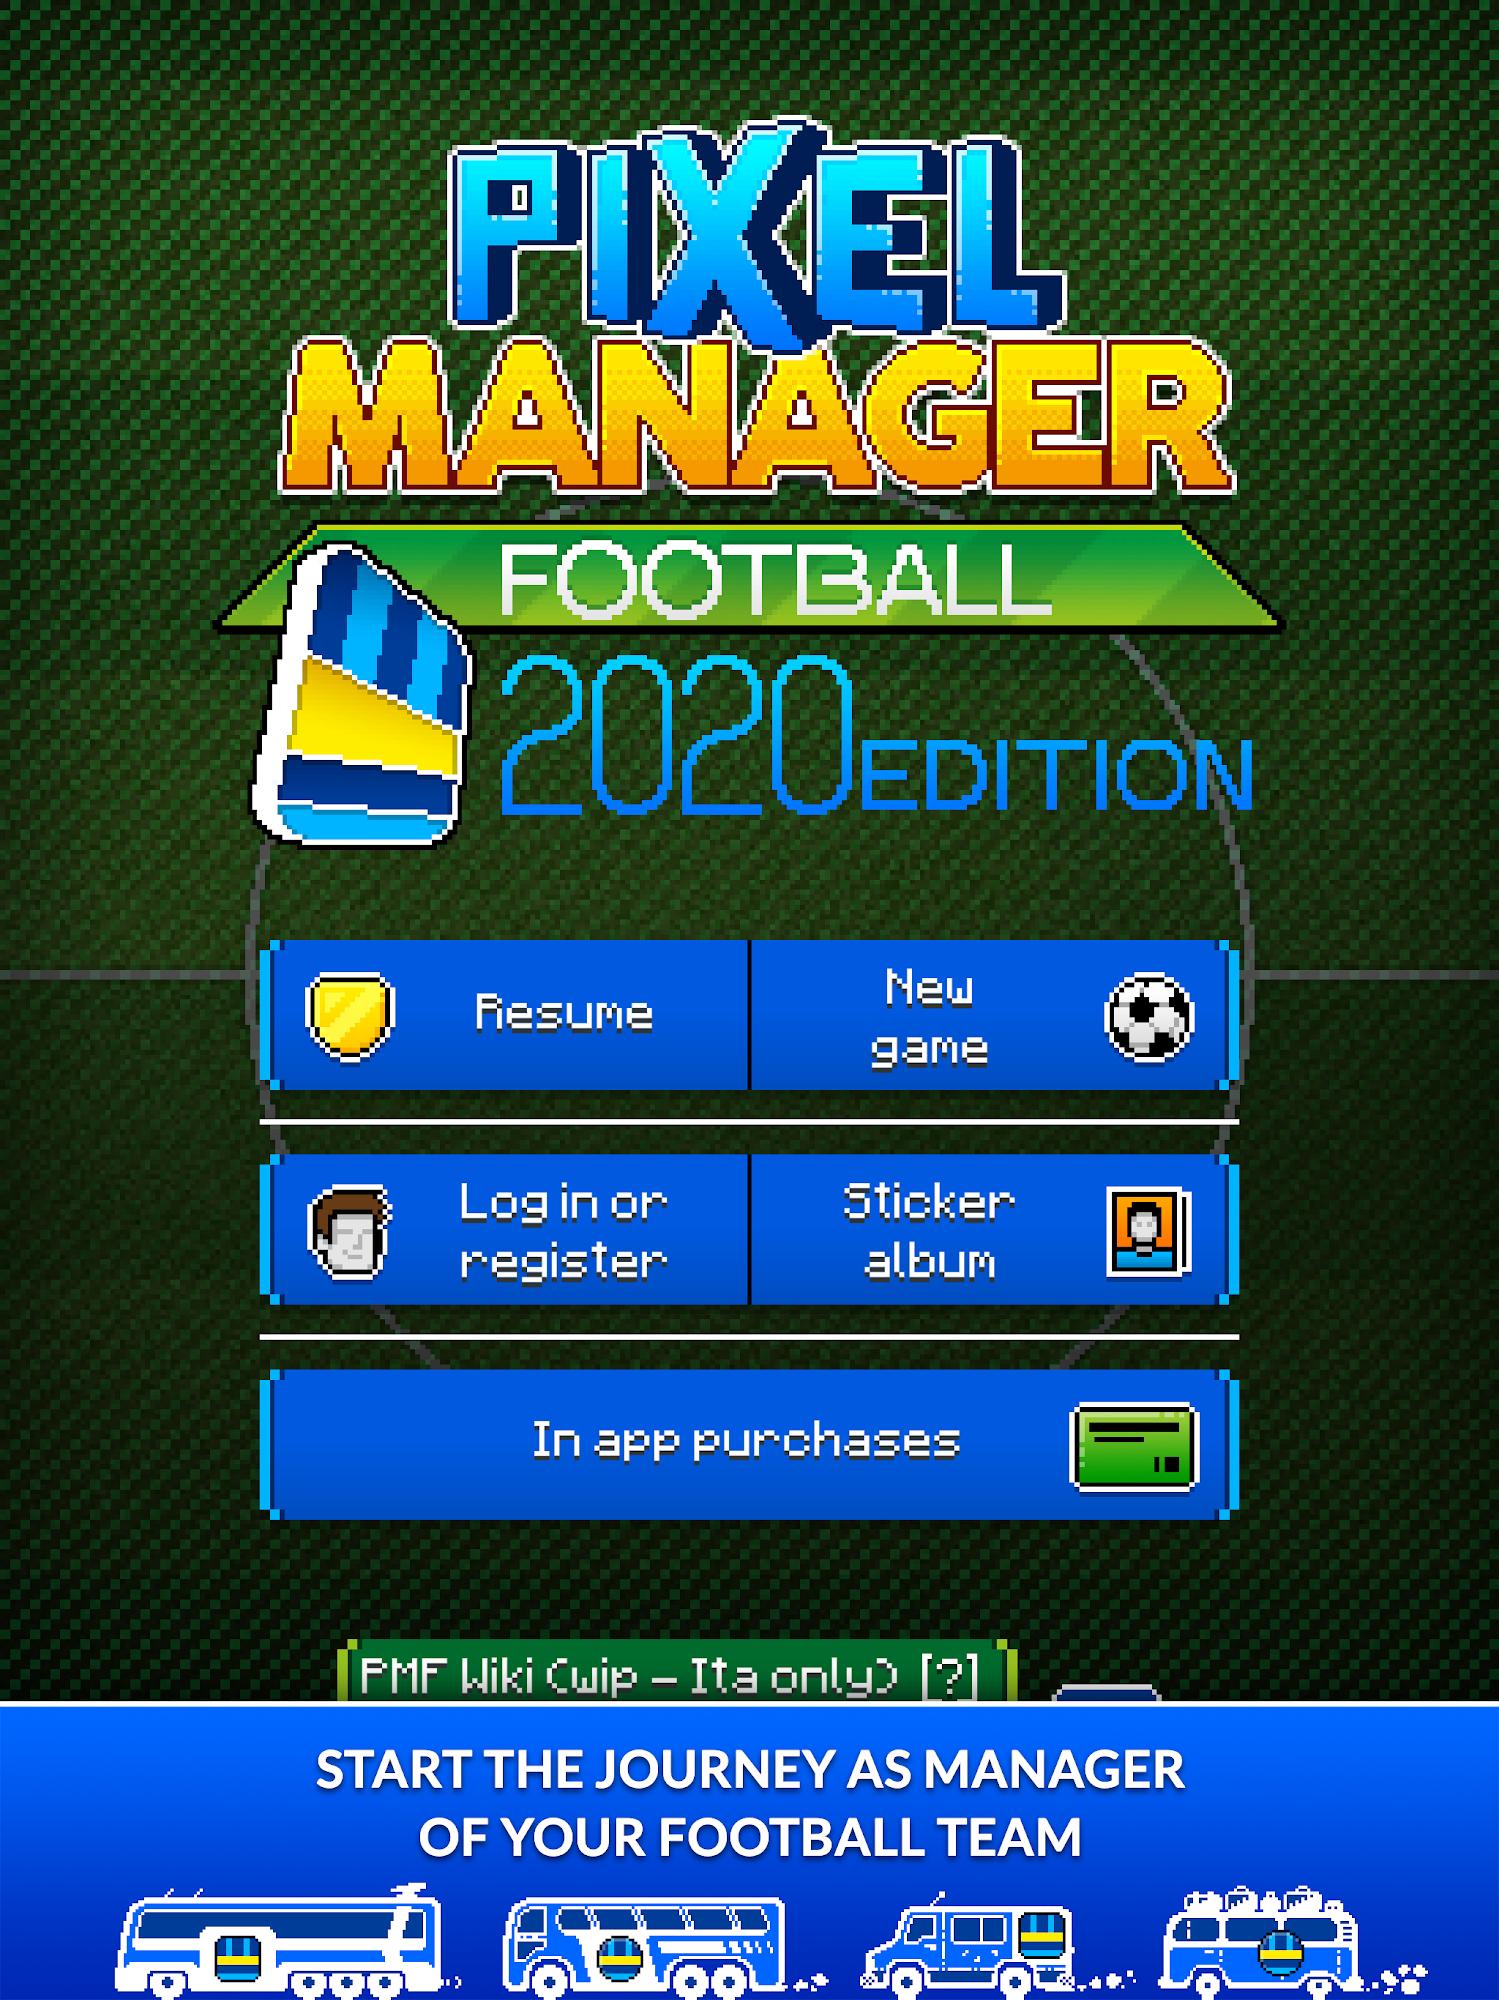 Pixel Manager: Football 2020 Edition スクリーンショット1